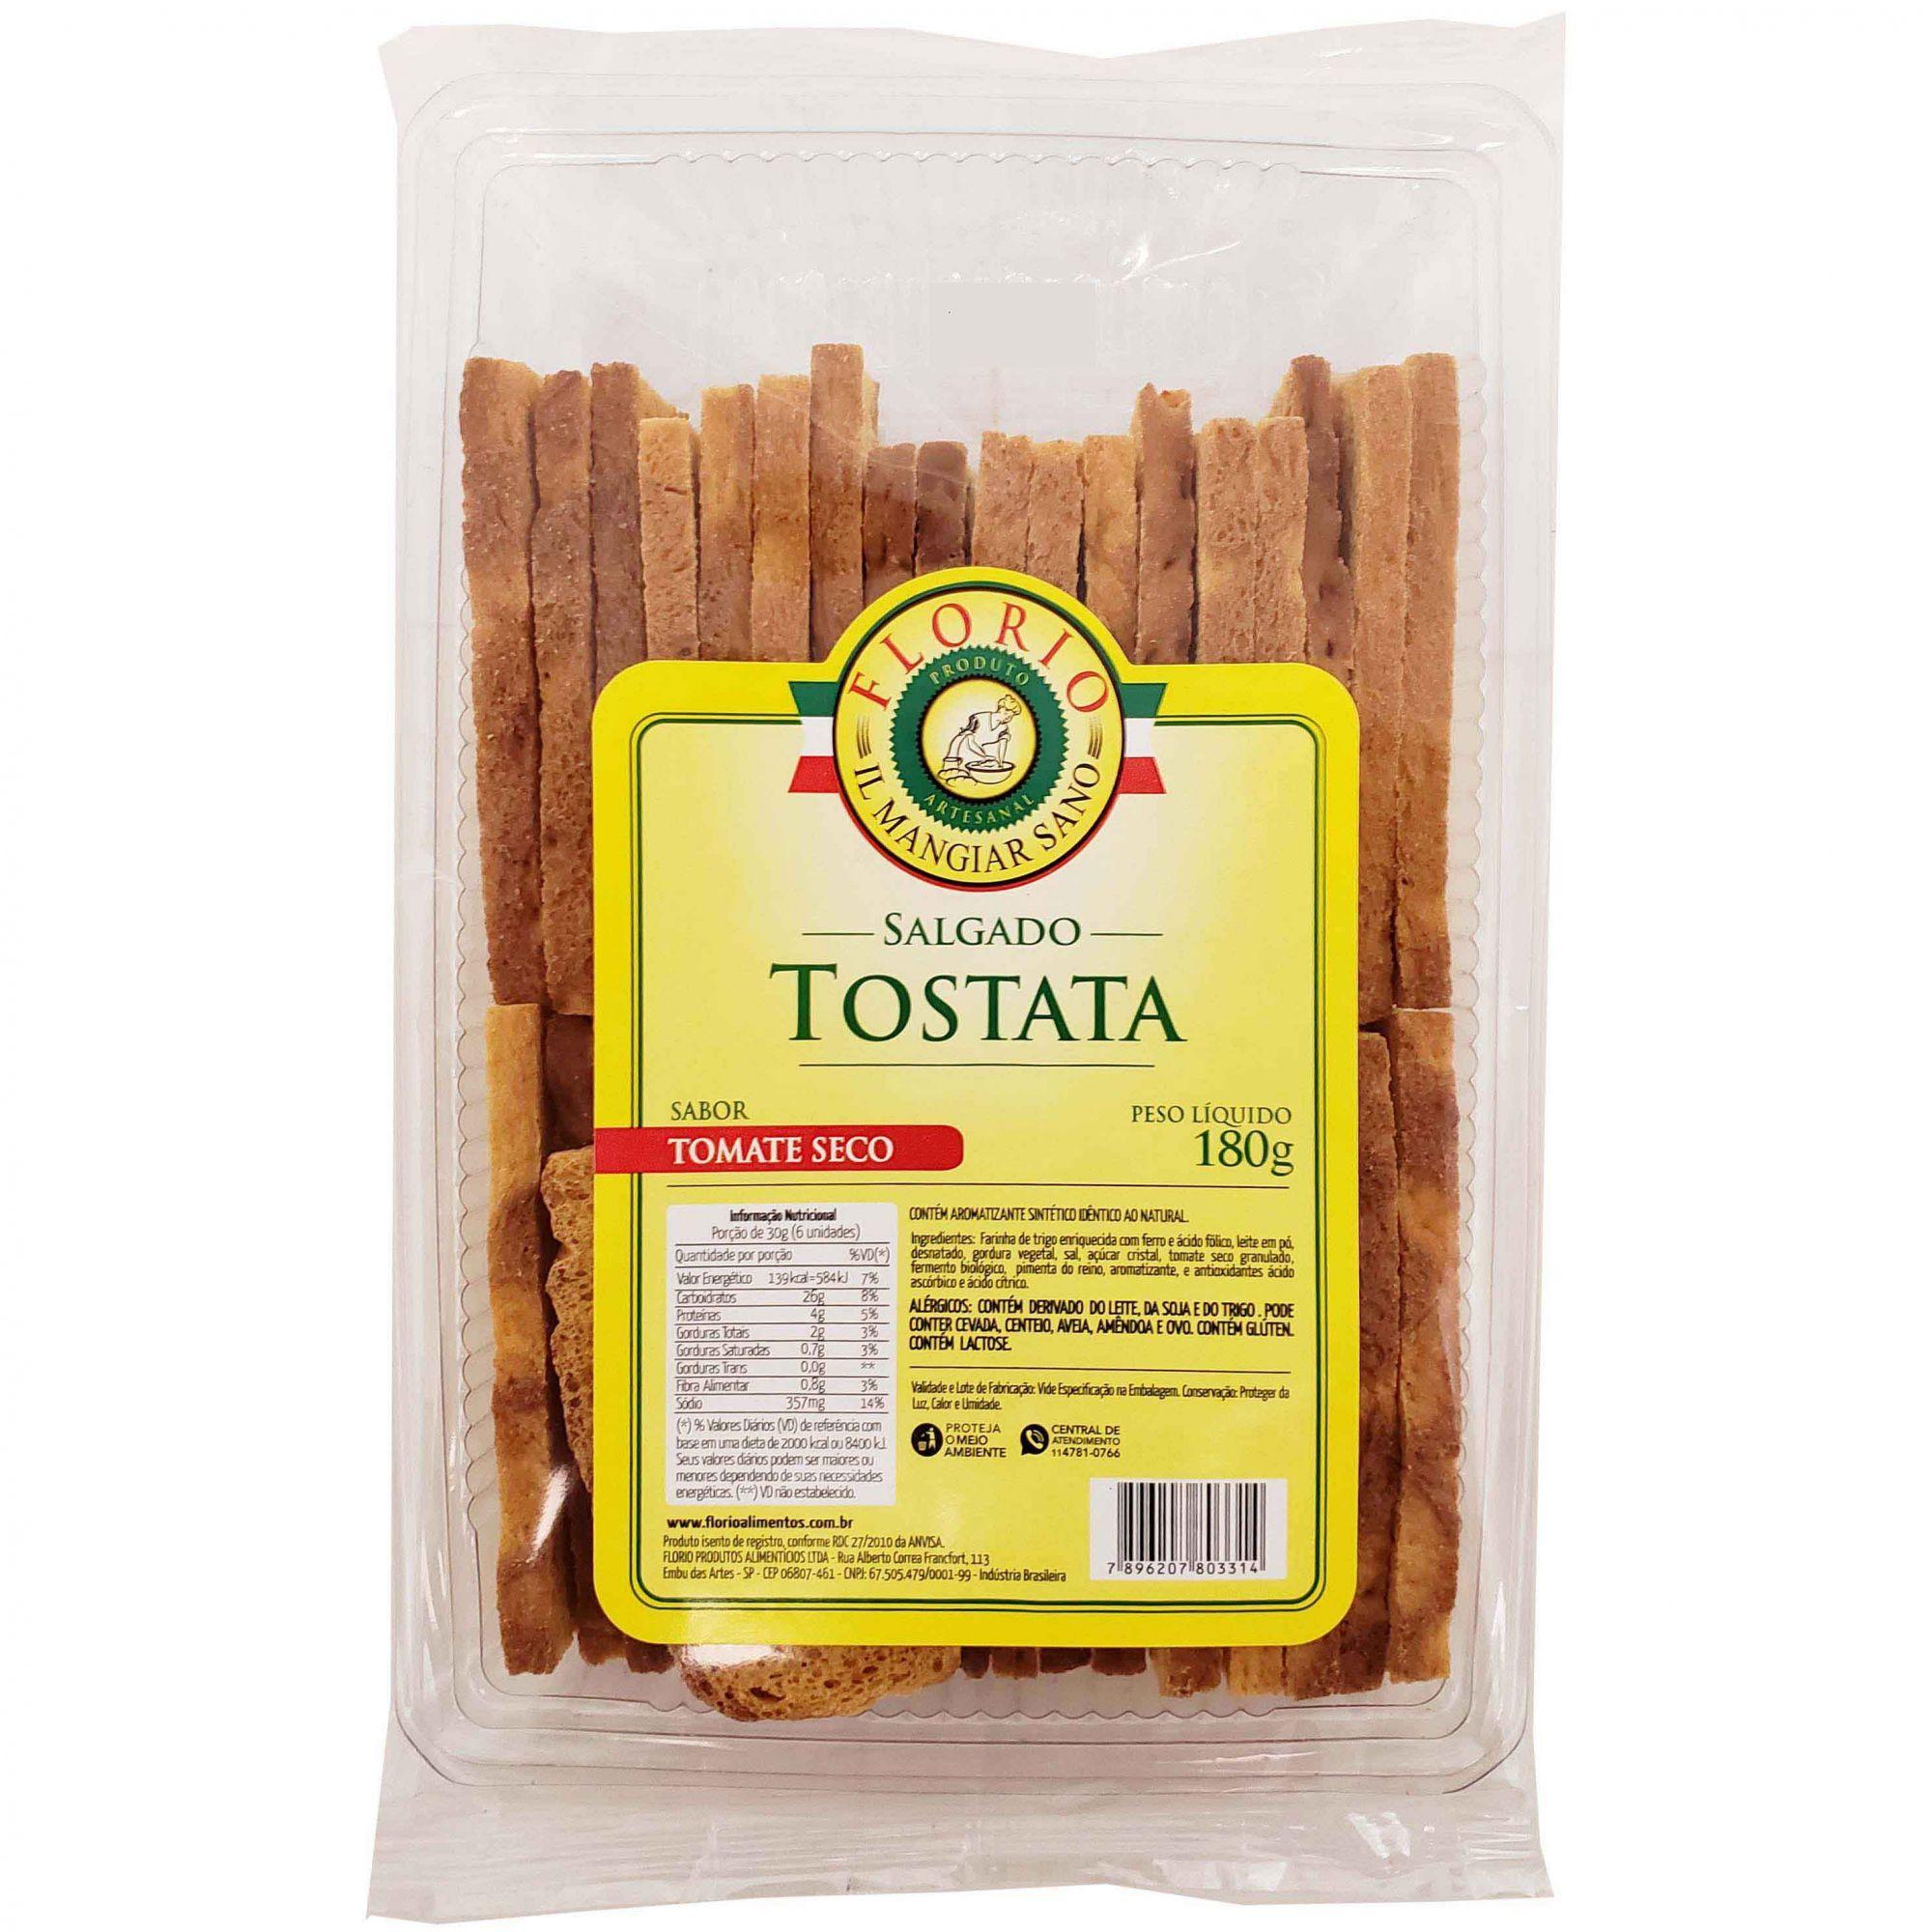 Torrada Tostata  Tomate Seco Florio - 180g -